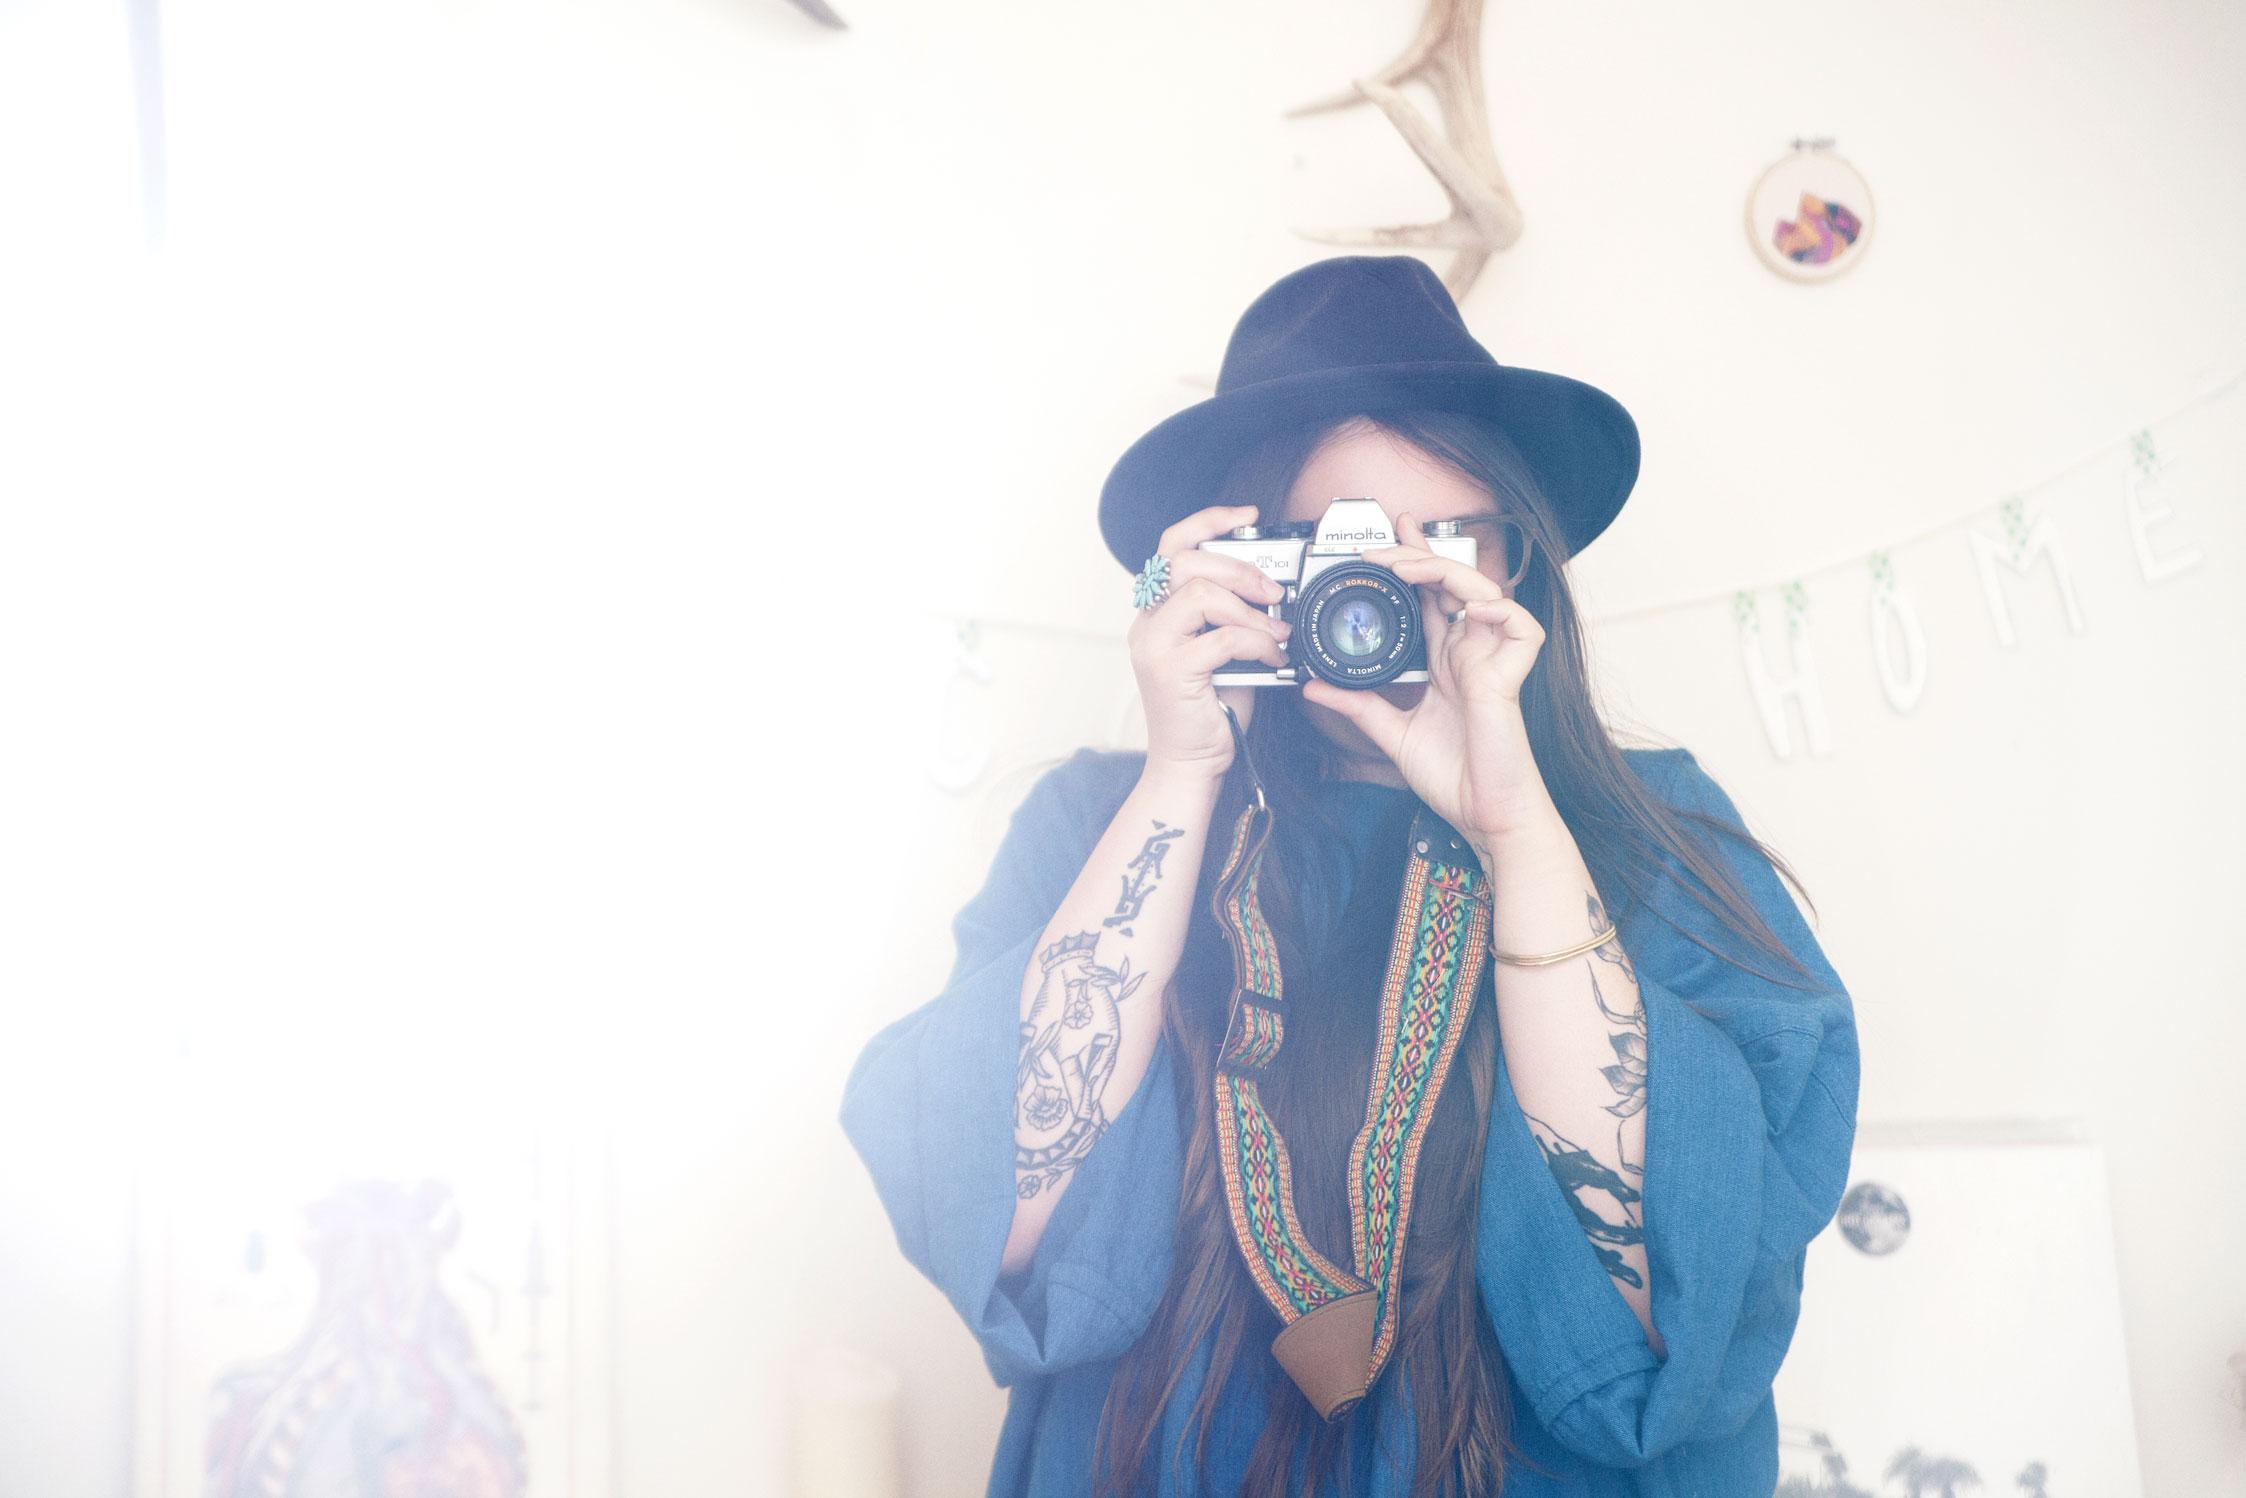 Tea Leigh inher Brooklyn studio.